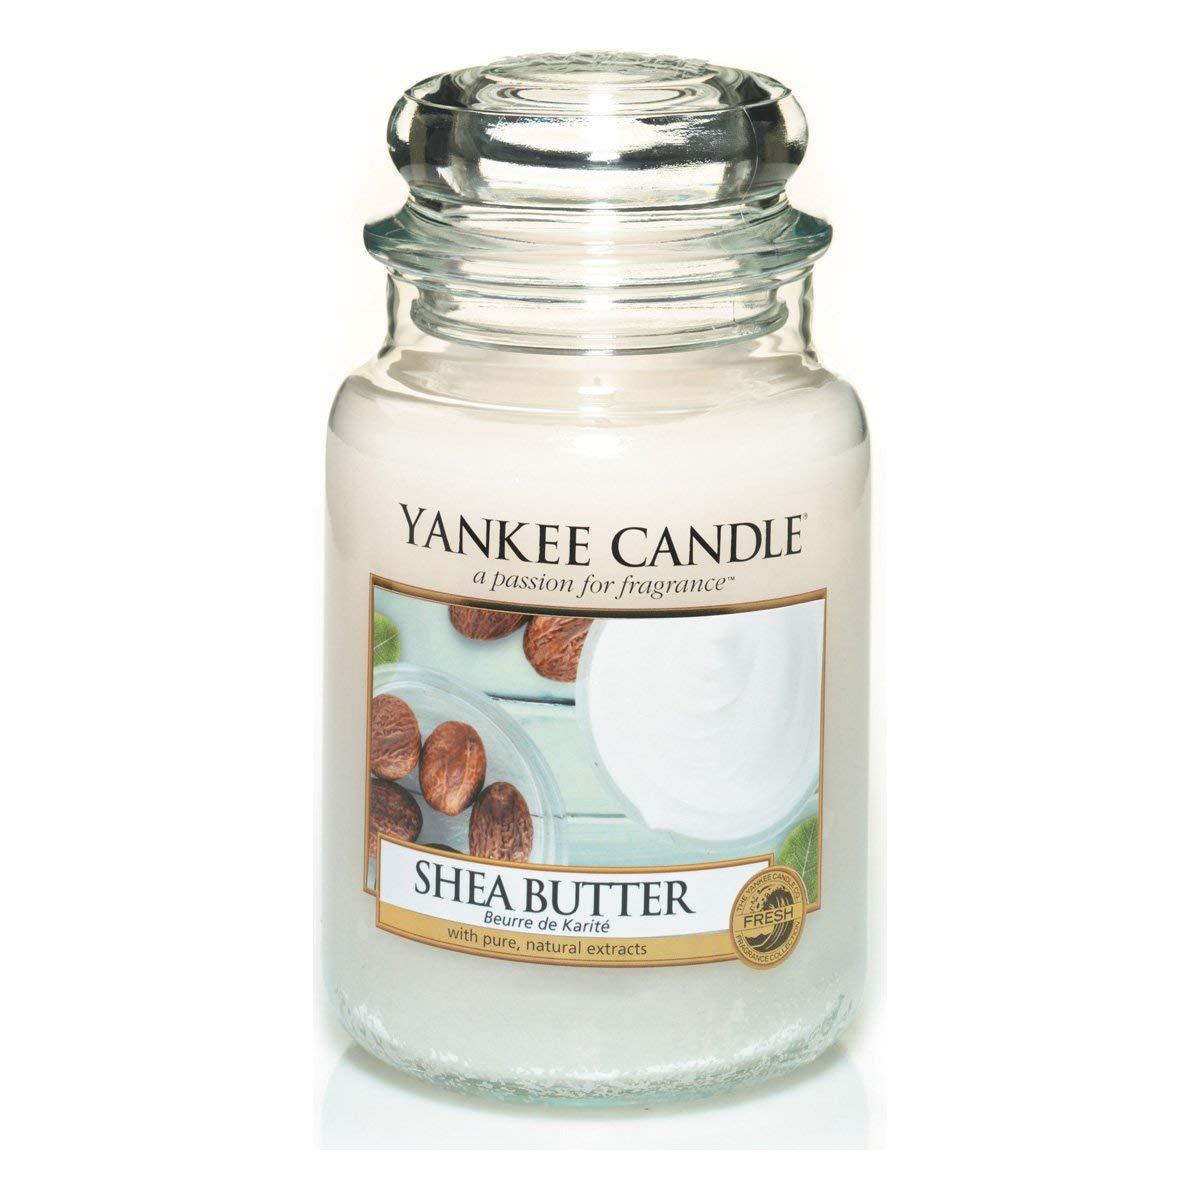 Shea Butter - Yankee Candle - Large Jar